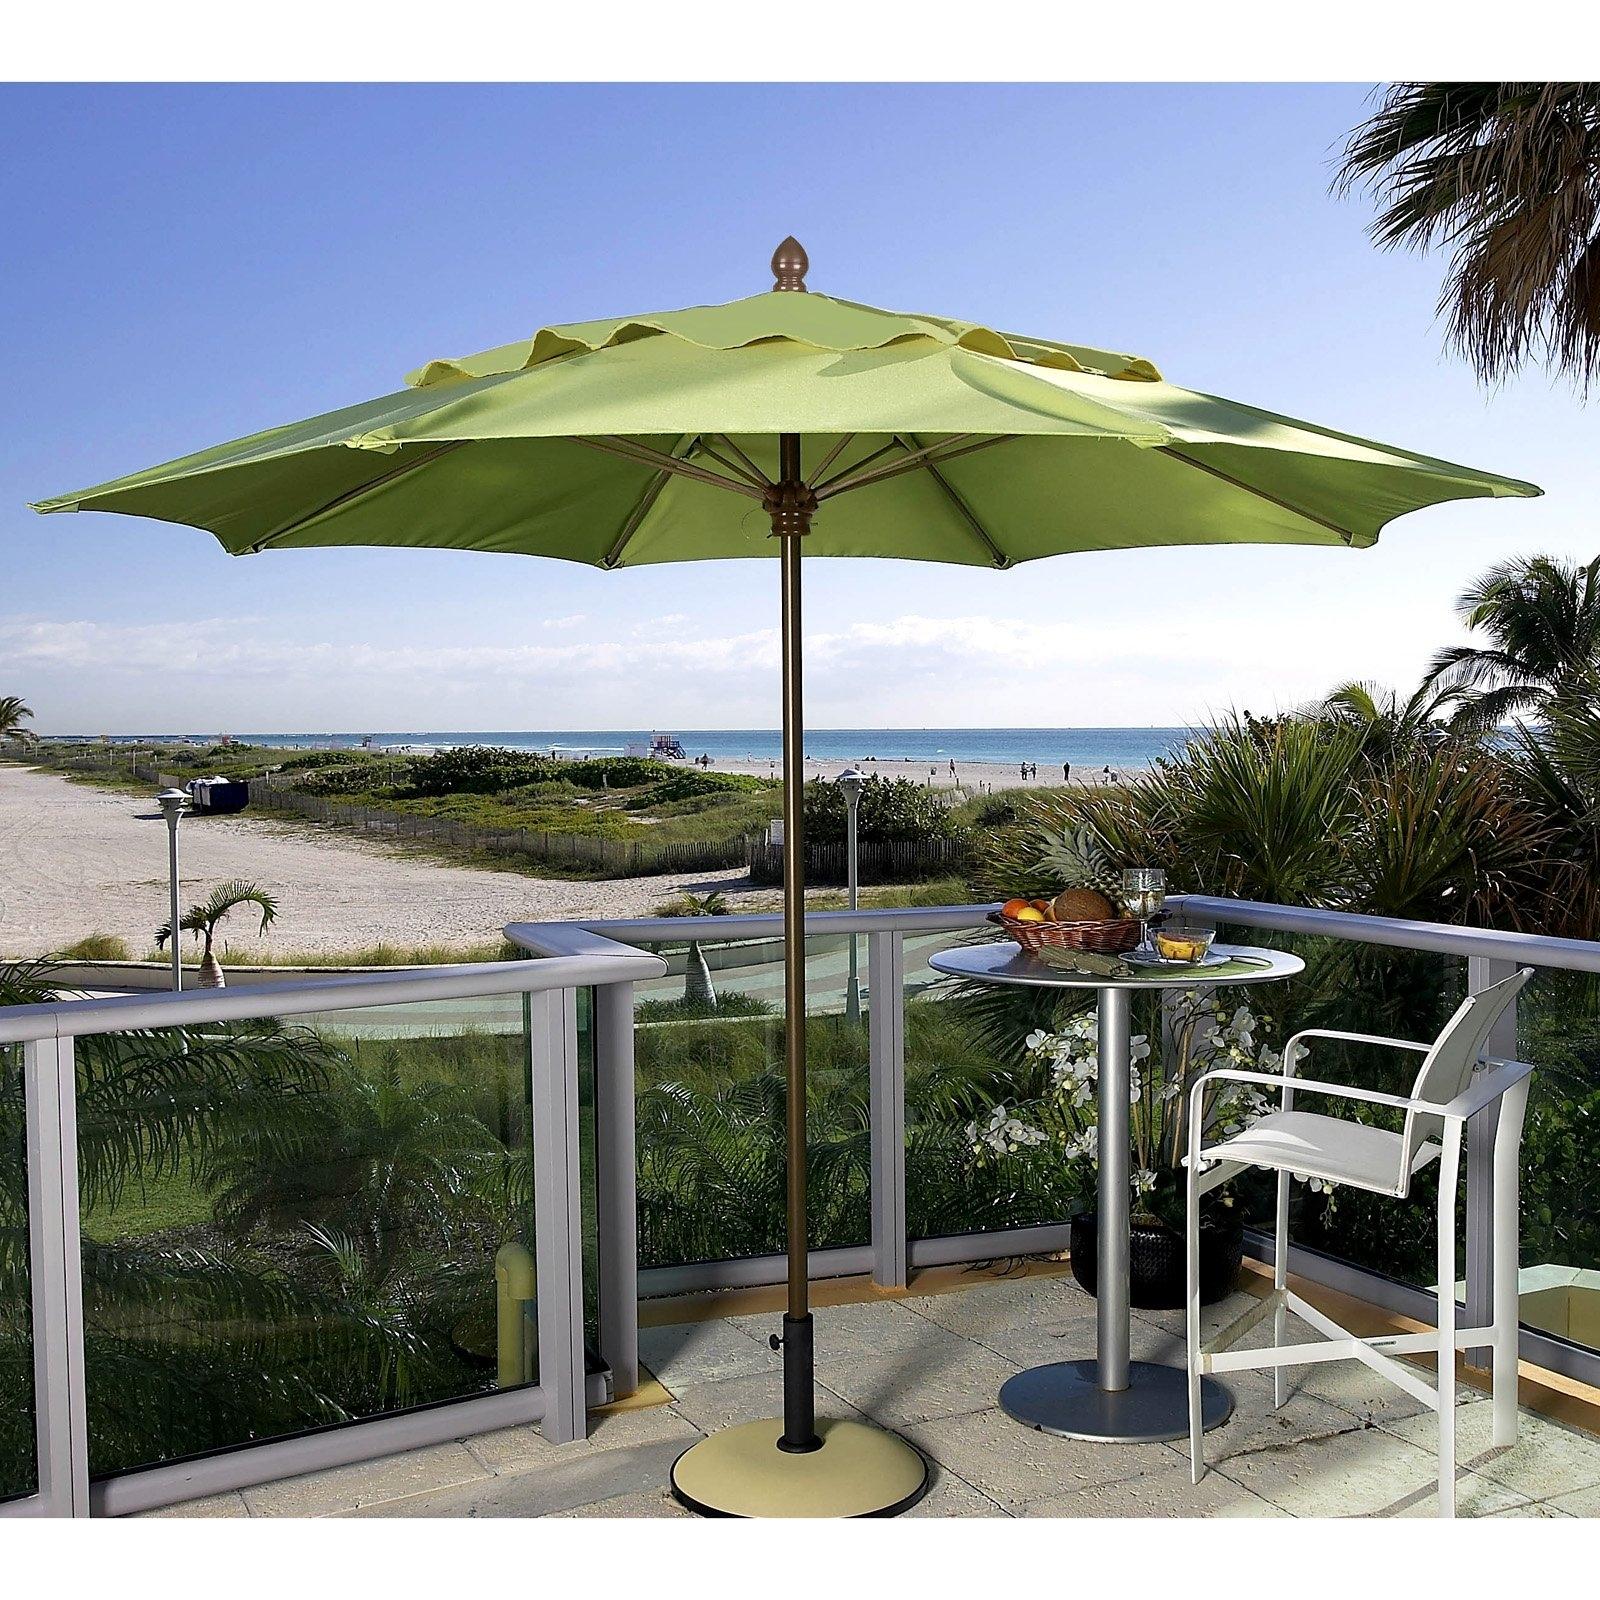 Preferred Oversized Patio Umbrellas Regarding Small Patio Umbrellas Sale (View 10 of 20)